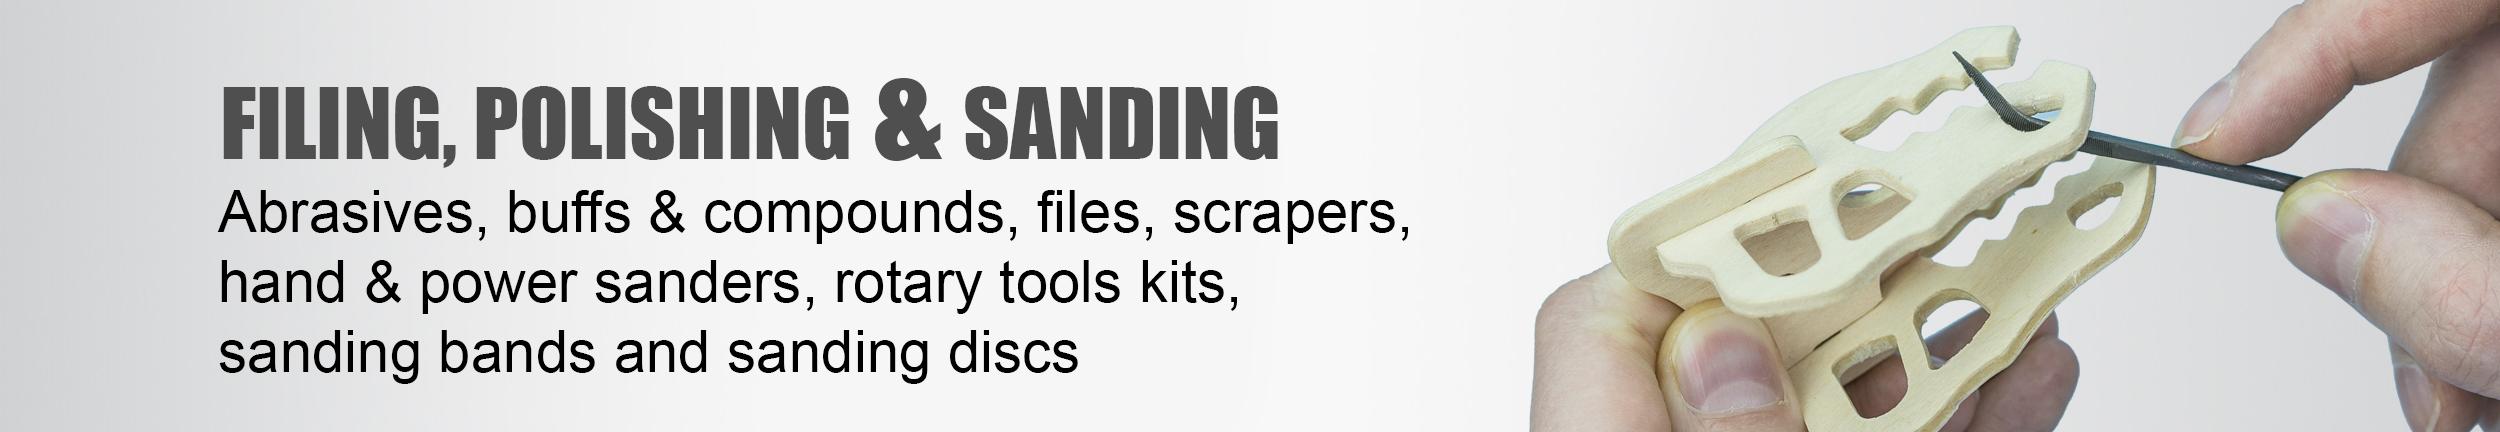 Filing, Polishing & Sanding